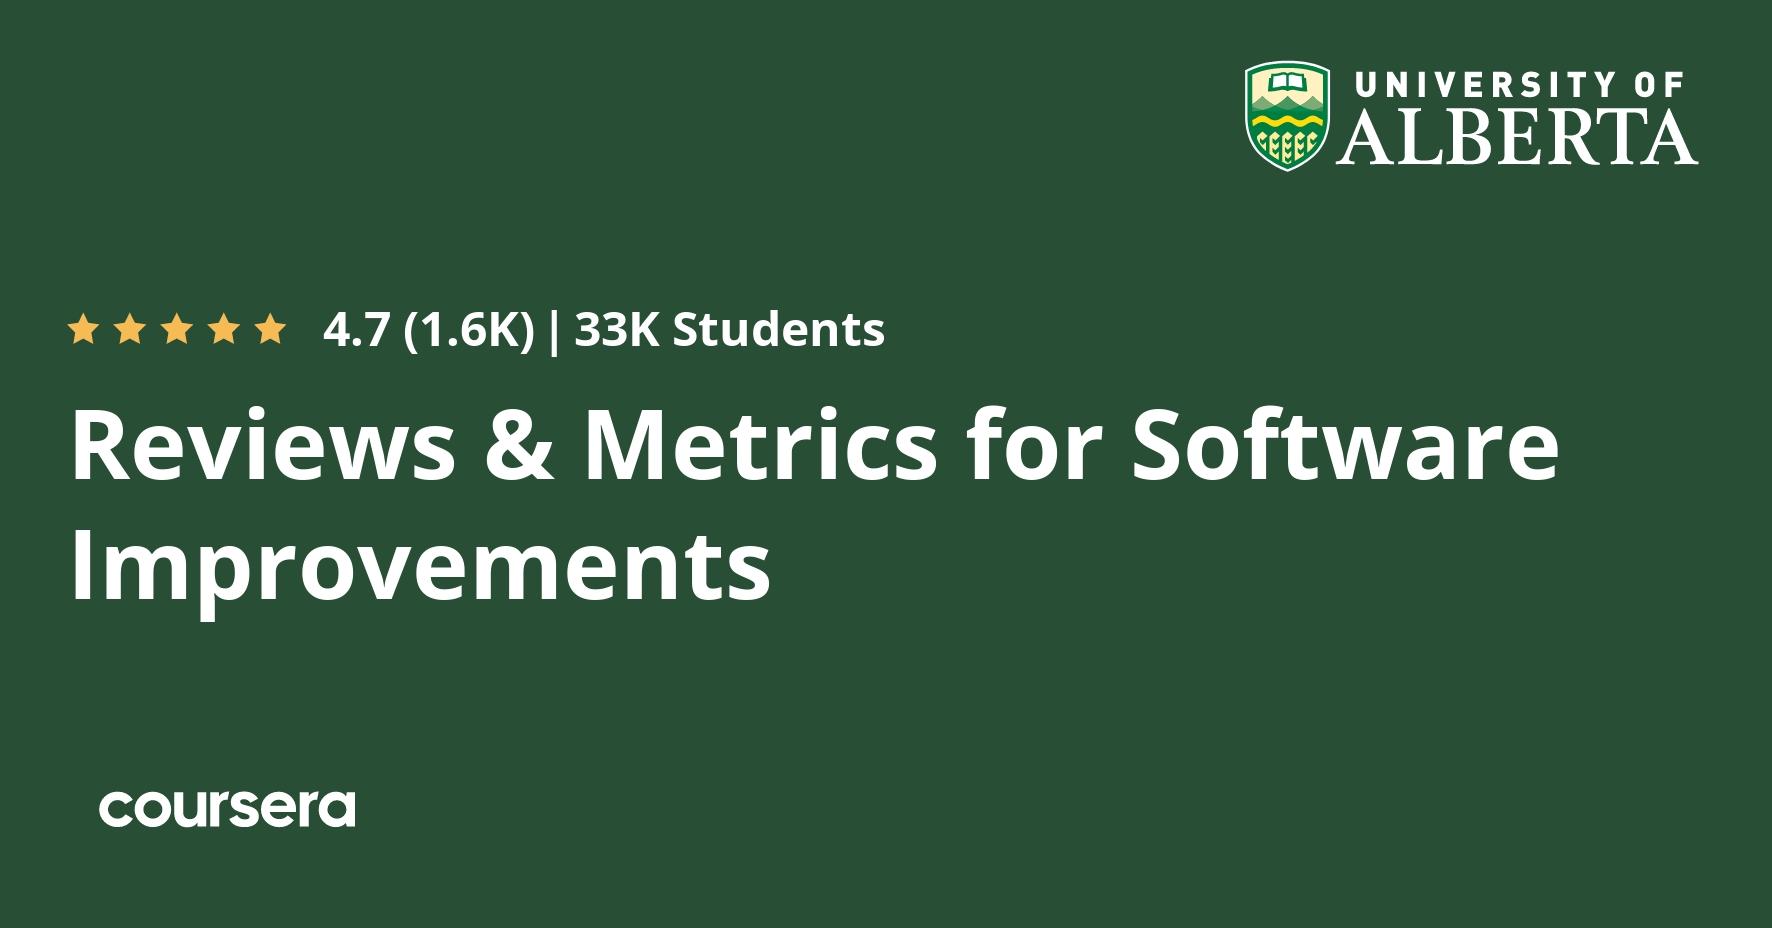 Reviews & Metrics for Software Improvements